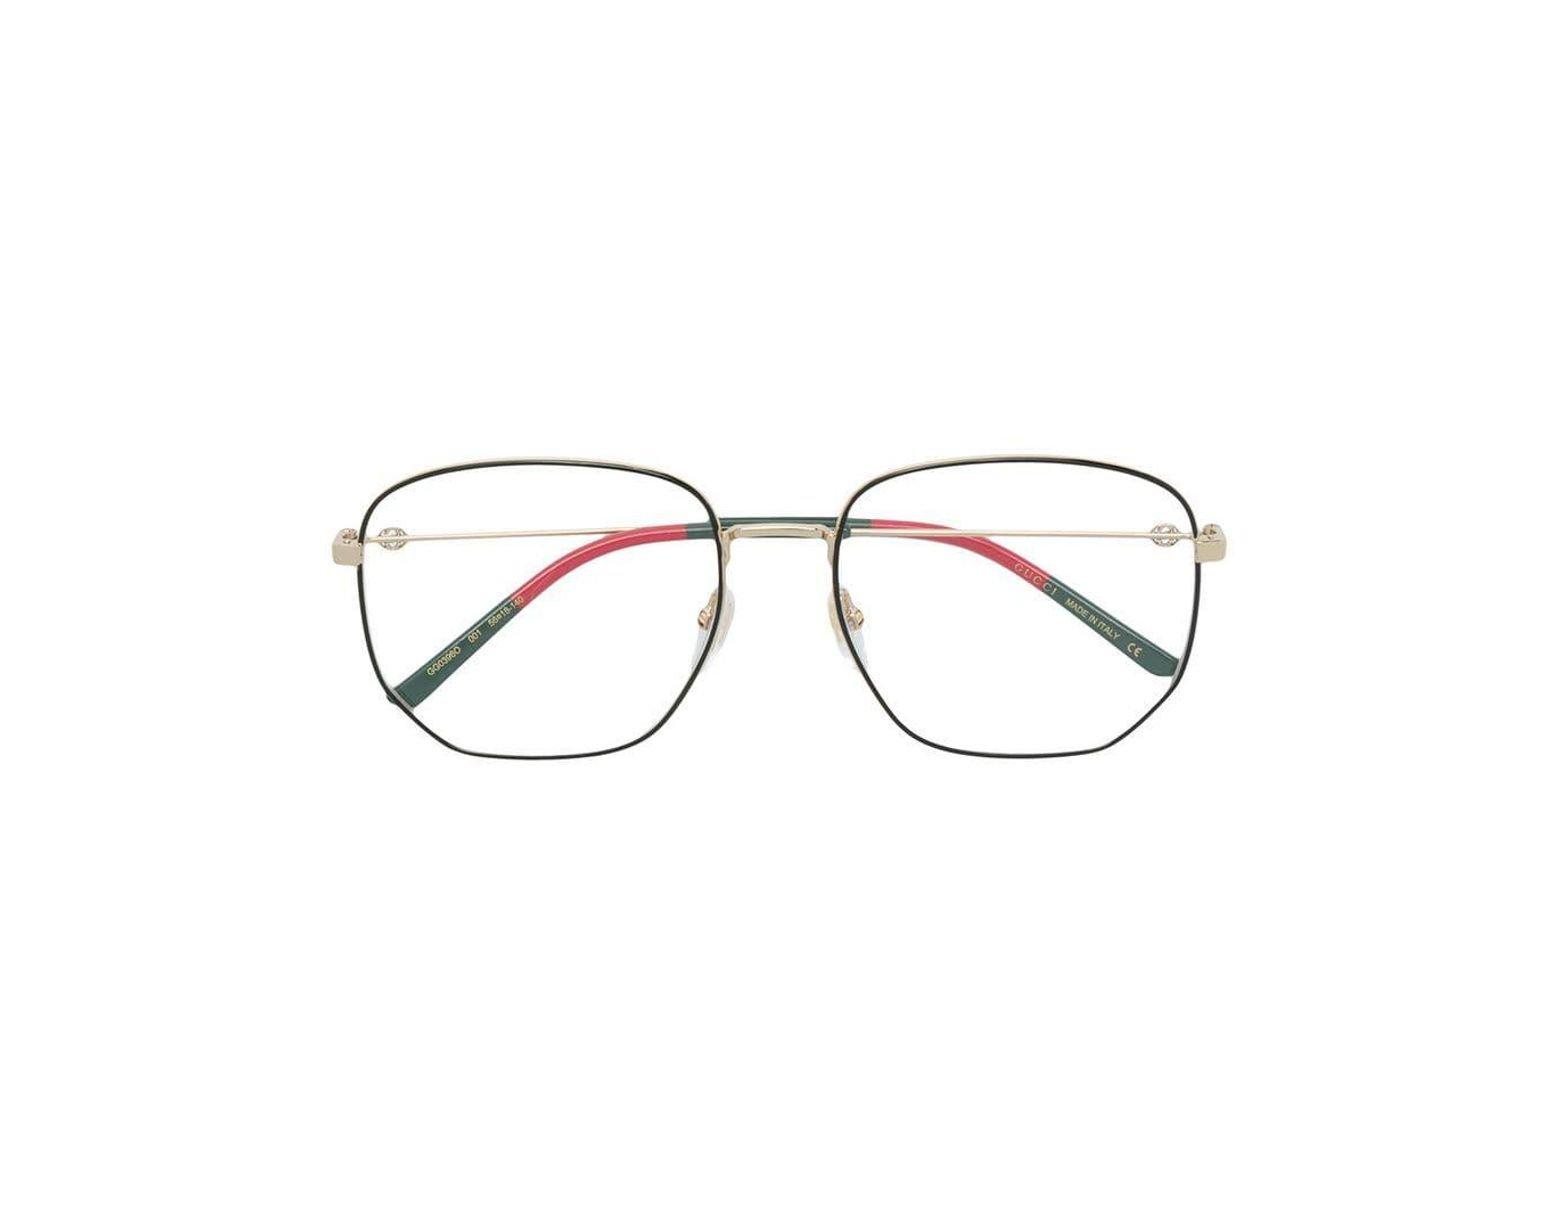 791523d25 Gucci Hexagonal Frame Glasses in Black - Lyst